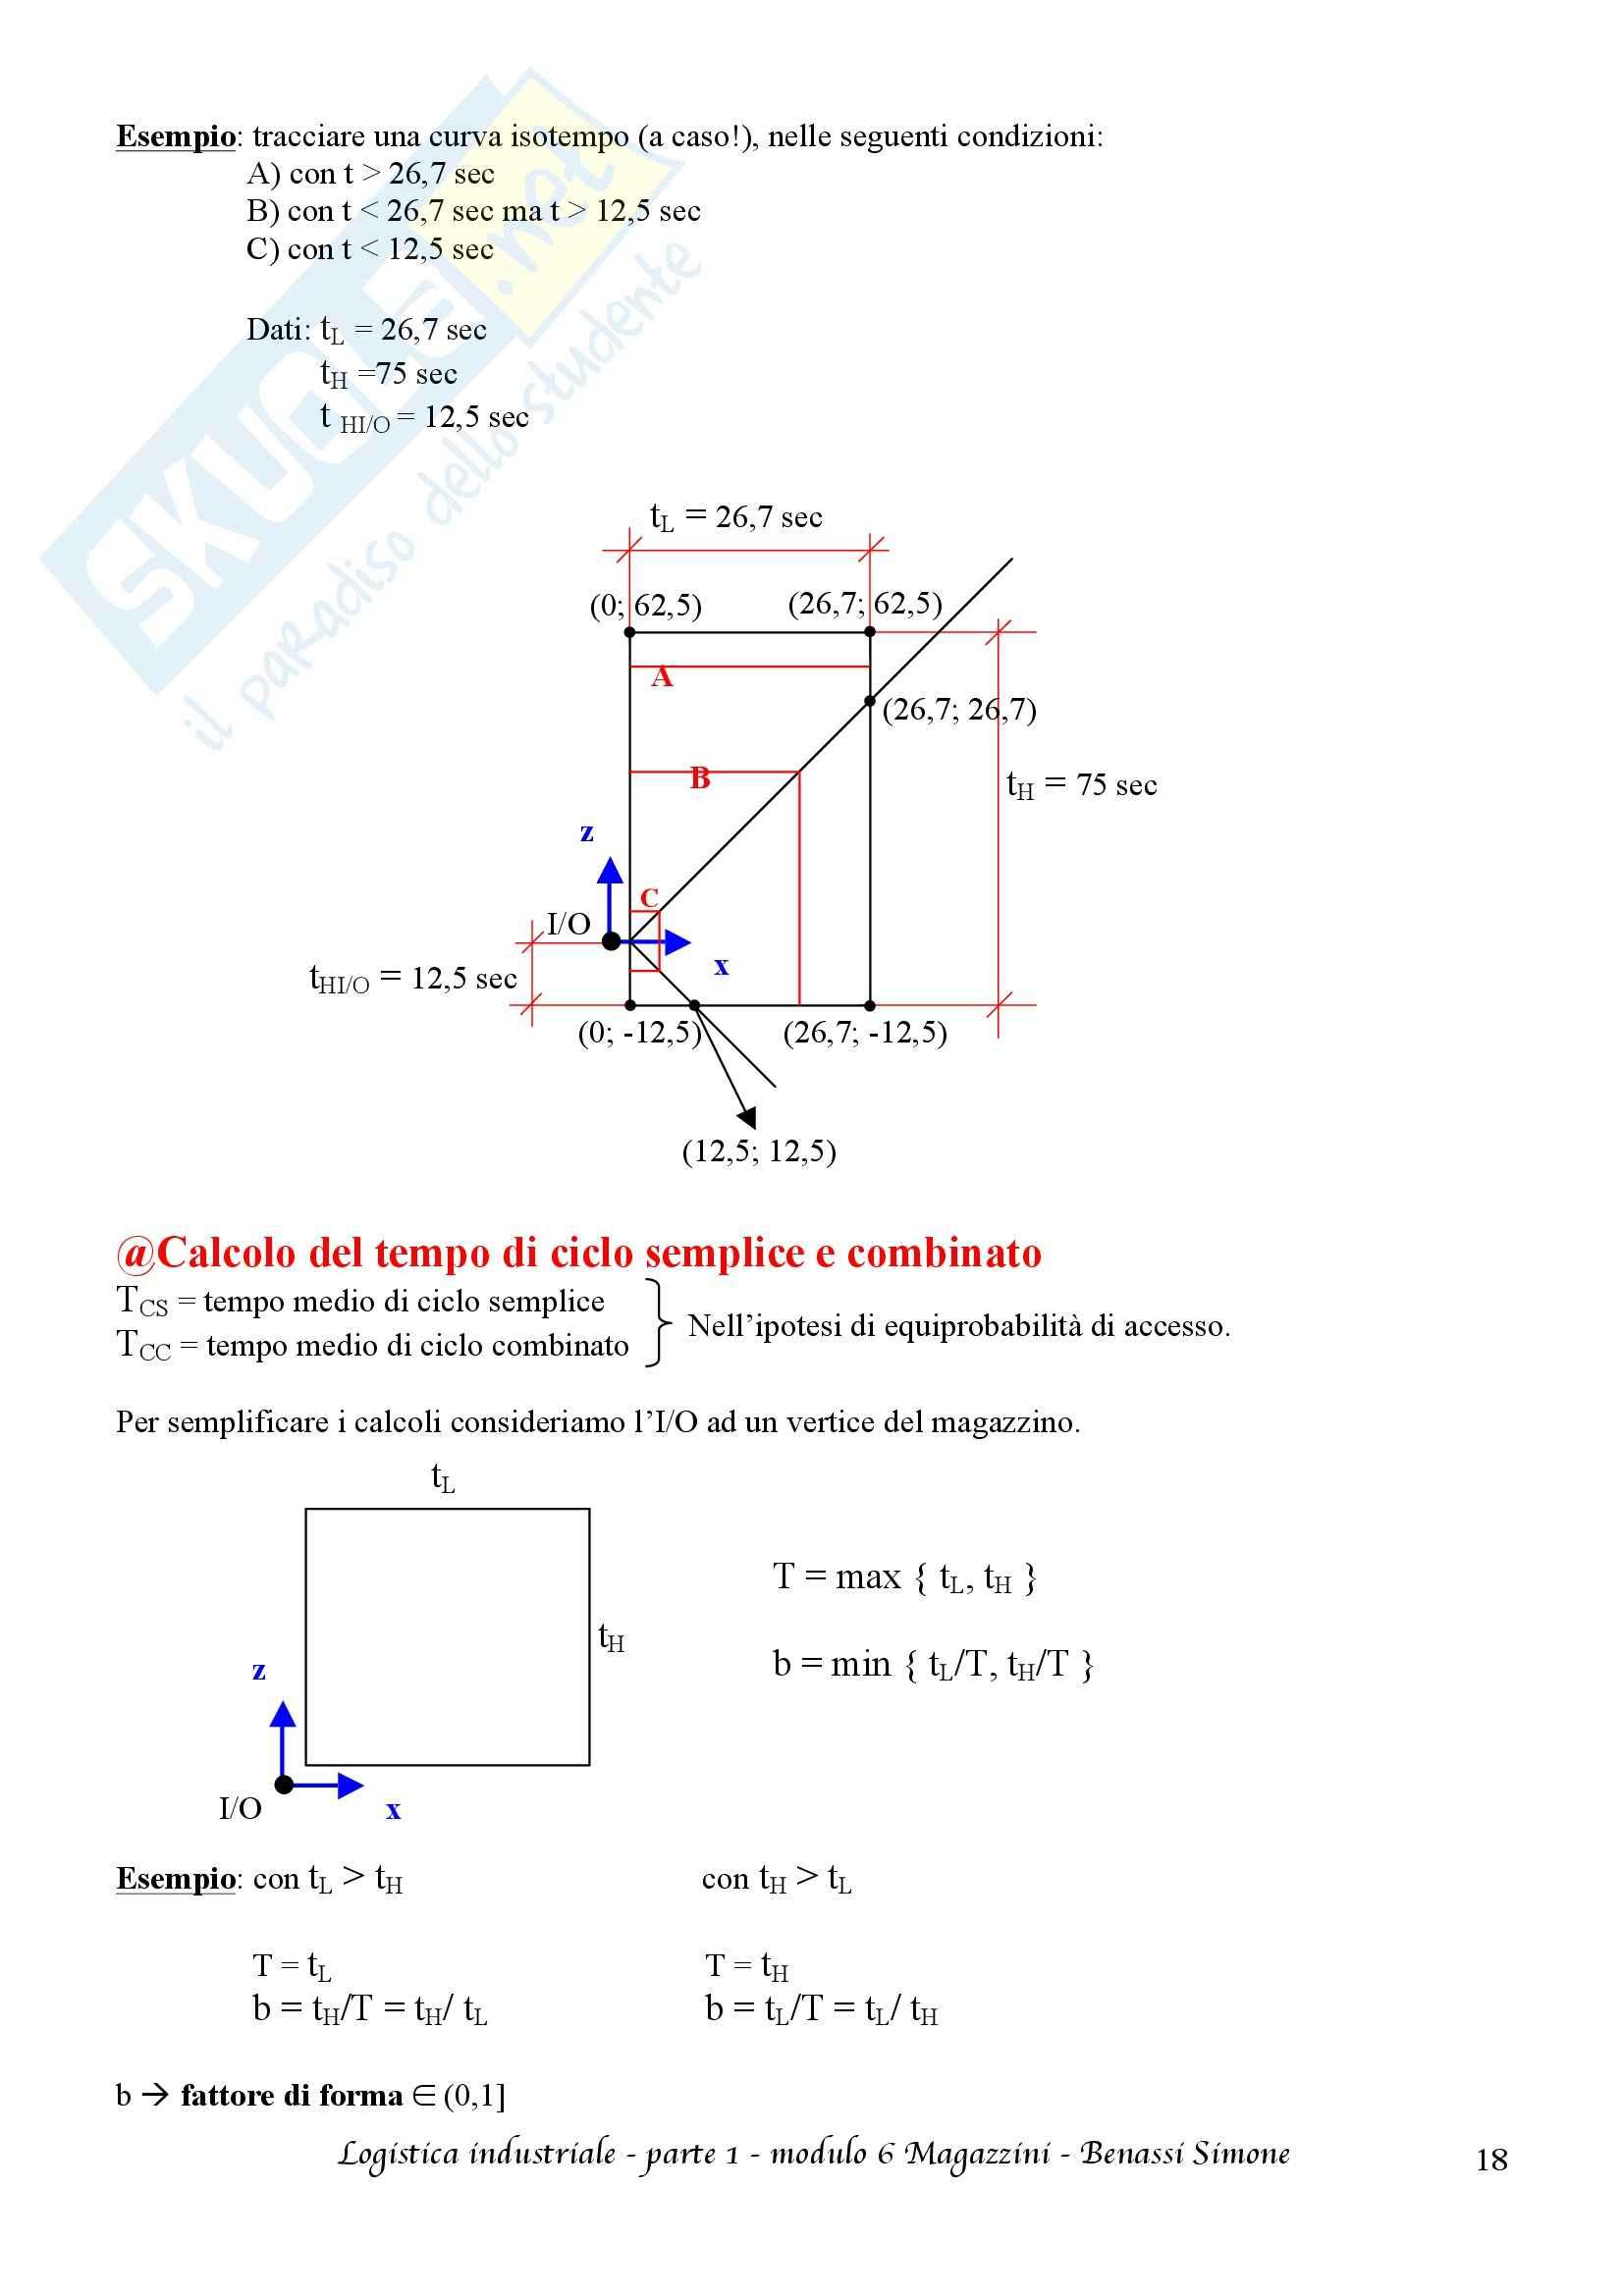 Logistica industriale T-AB - Appunti prima parte Pag. 51